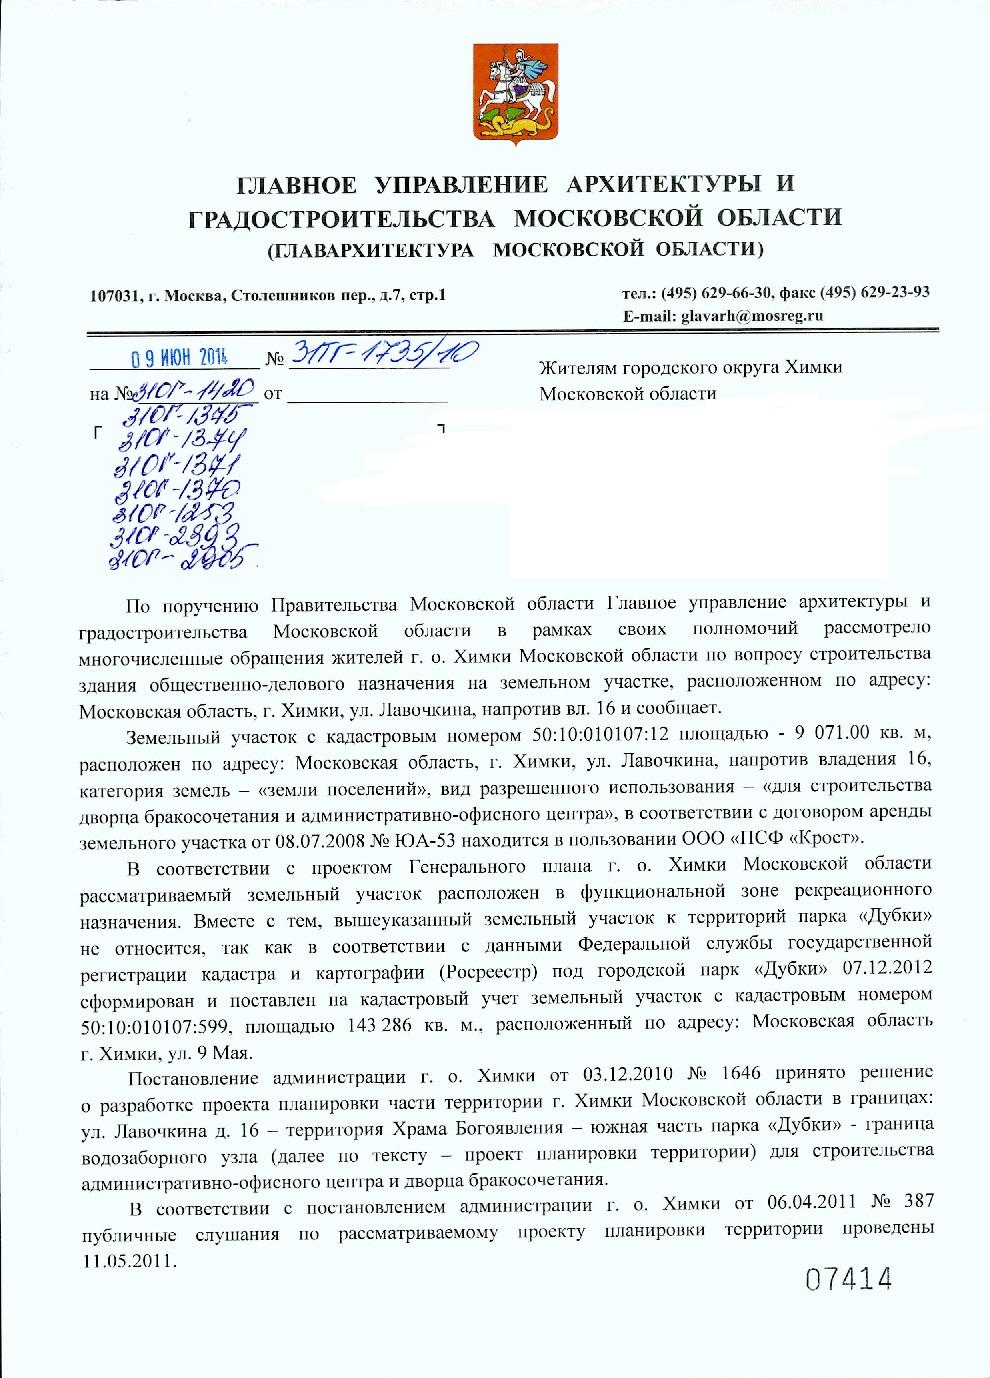 06-2014-Главархитектура1